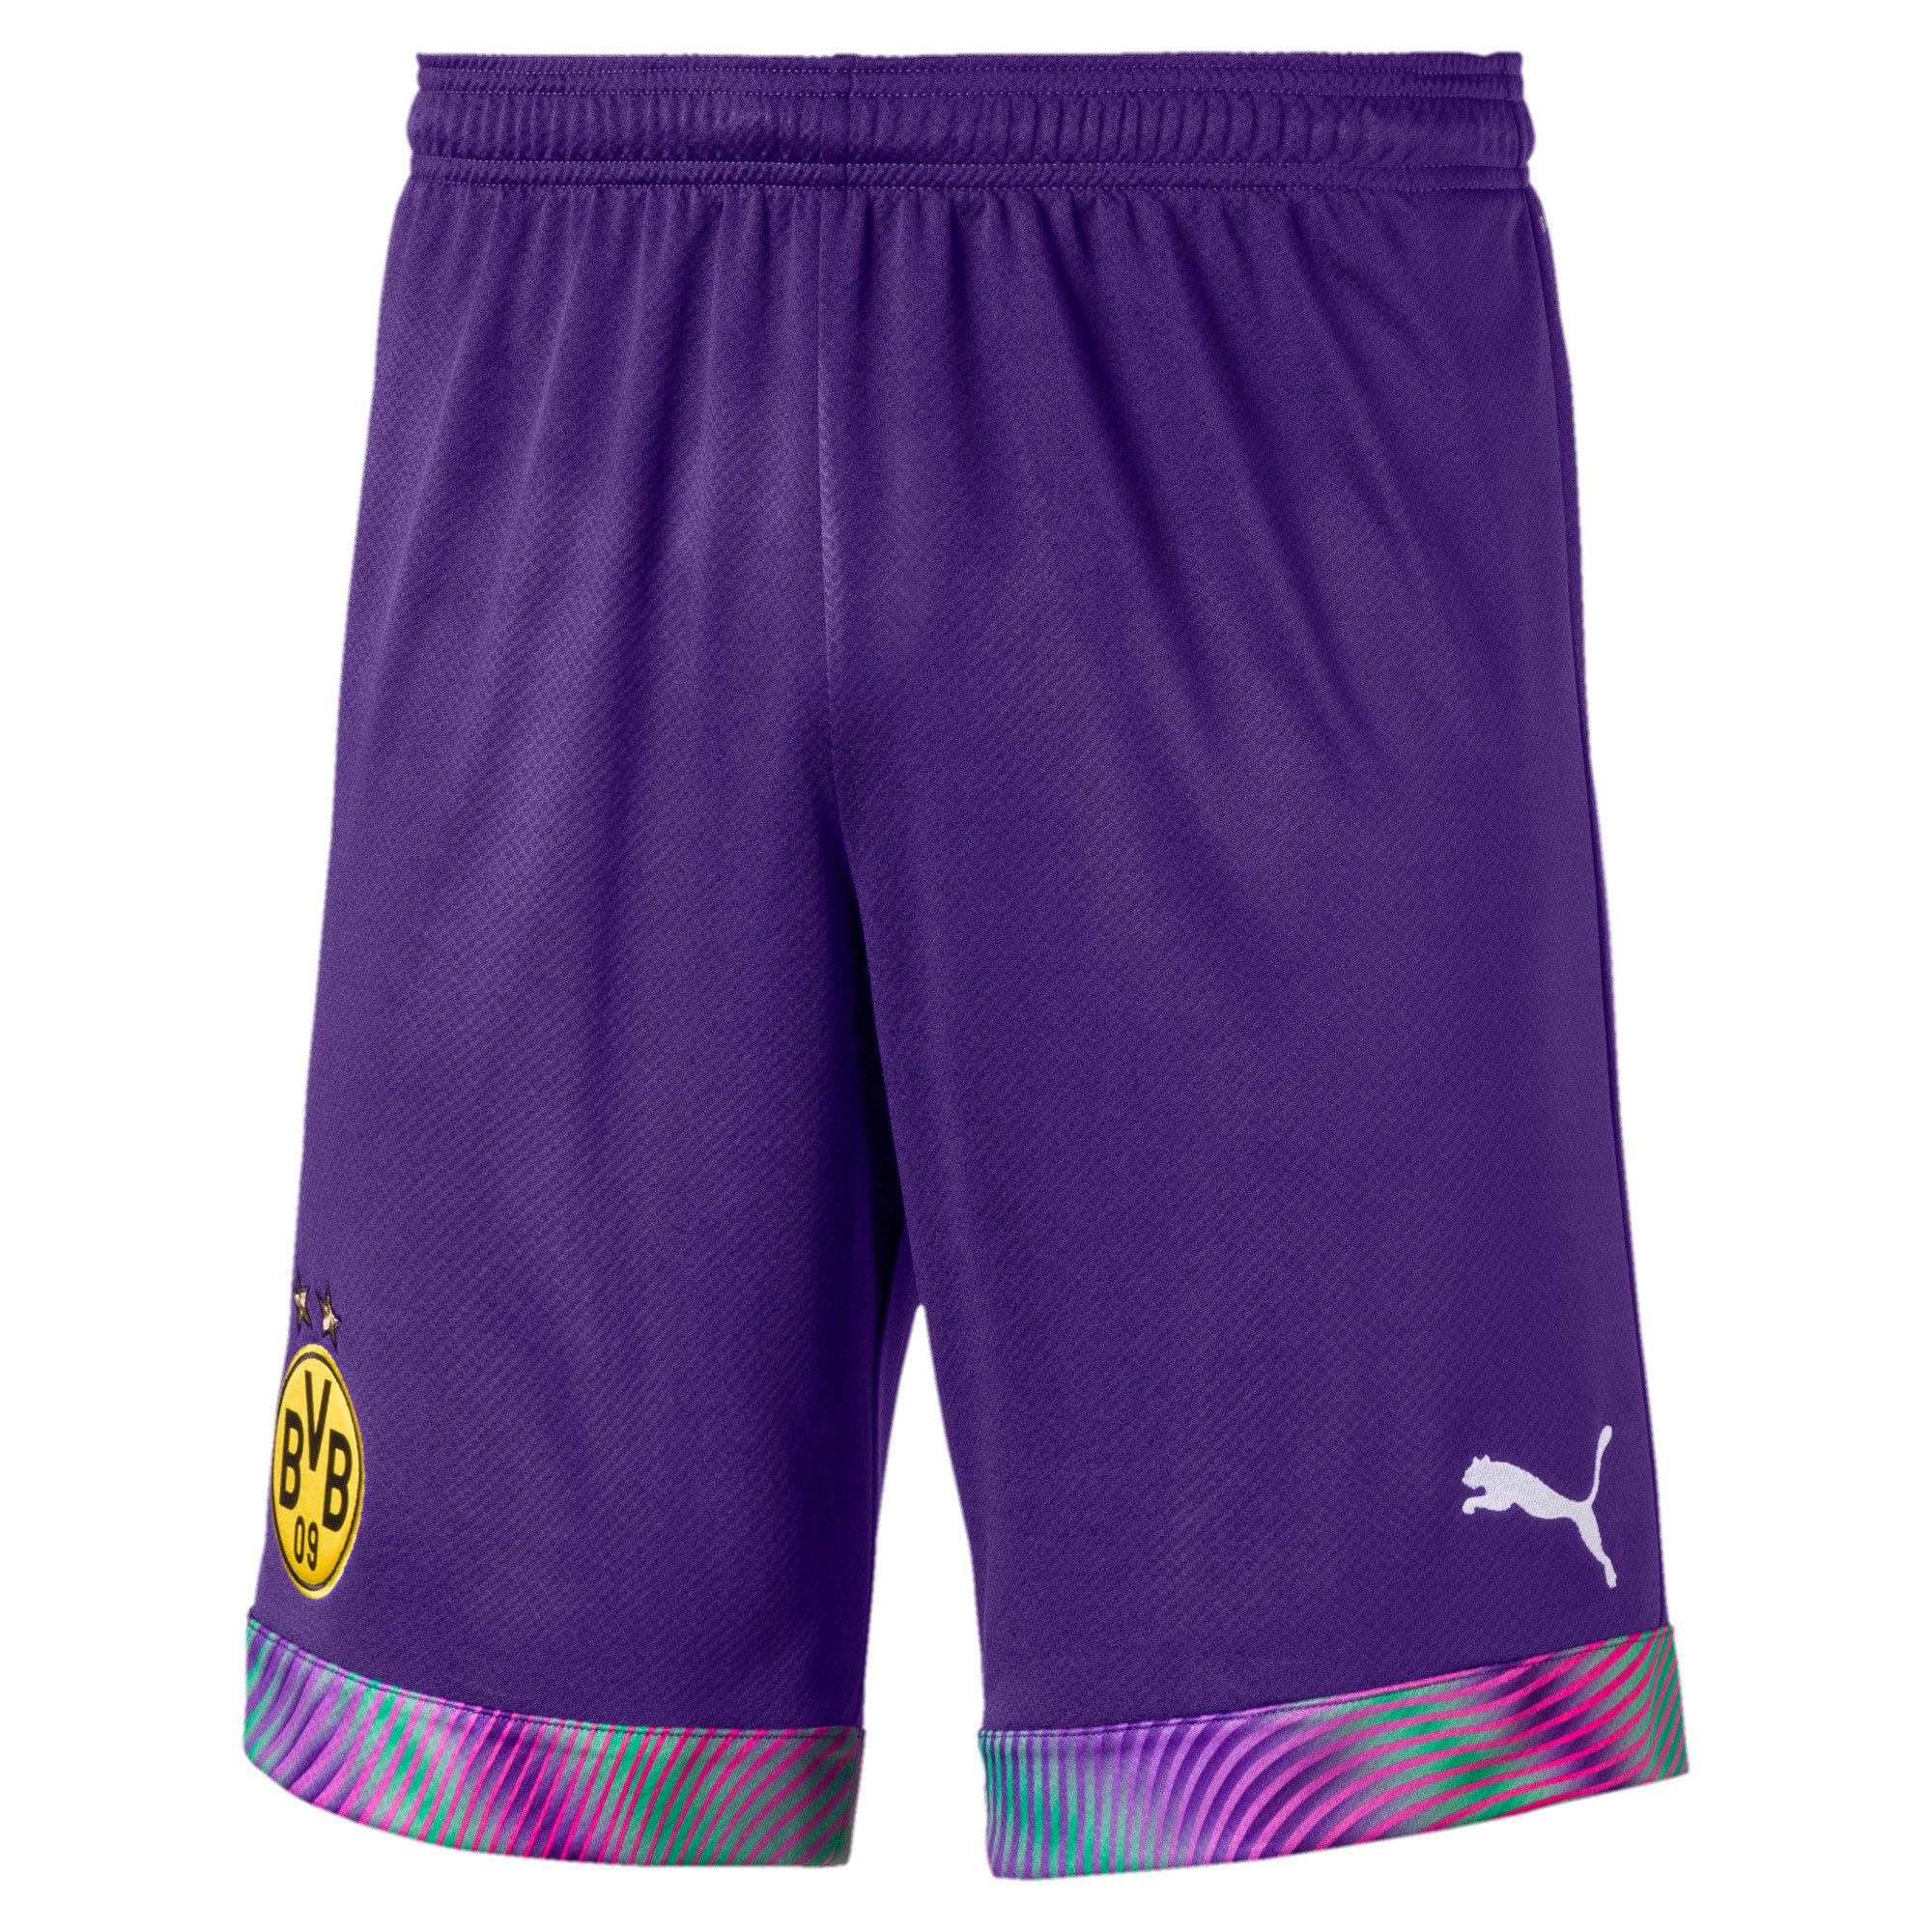 Thumbnail 1 of BVB Men's Replica Goalkeeper Shorts, Prism Violet, medium